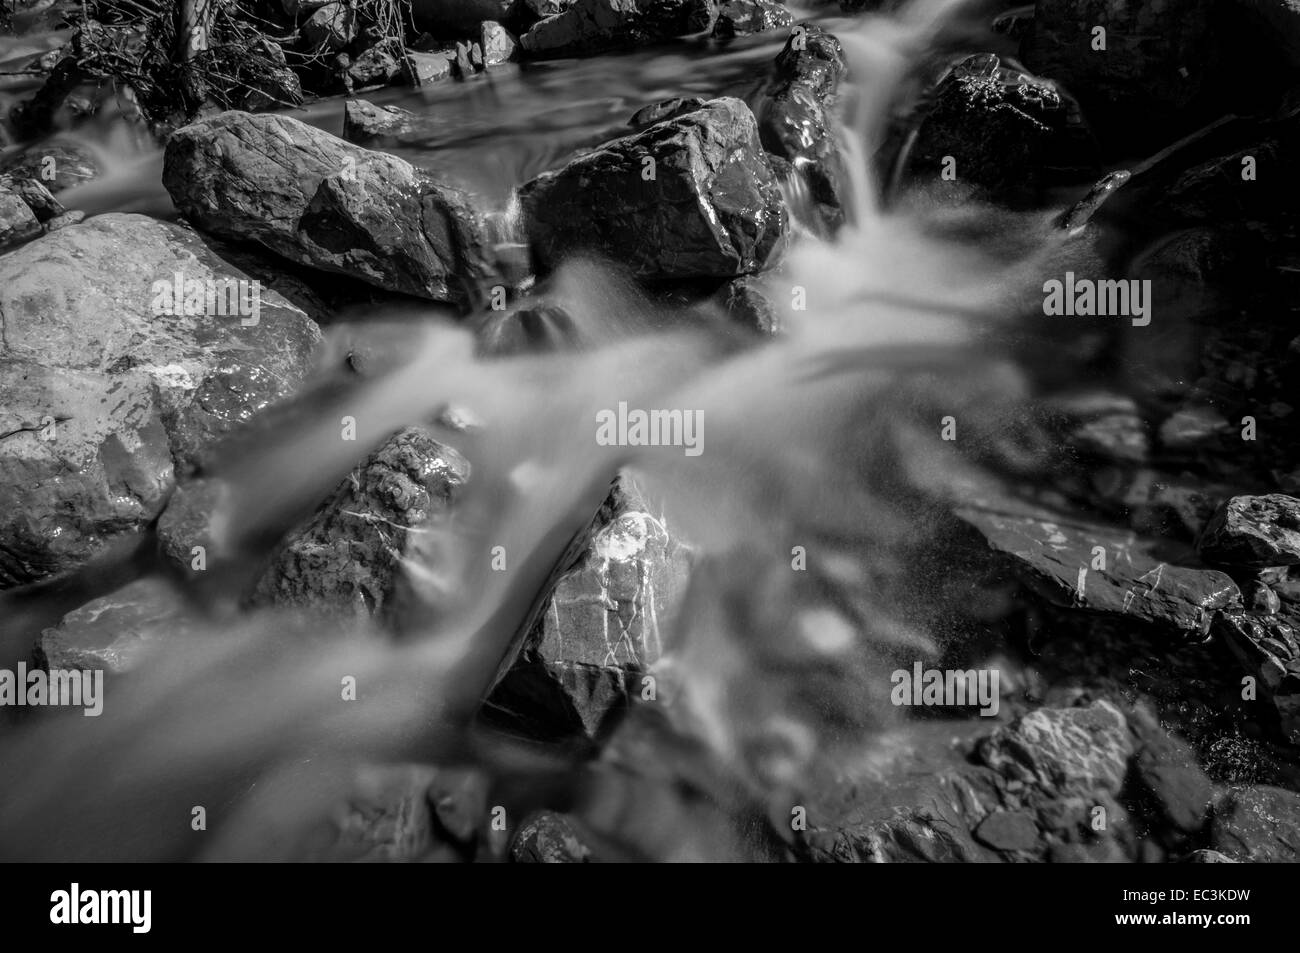 water - Stock Image